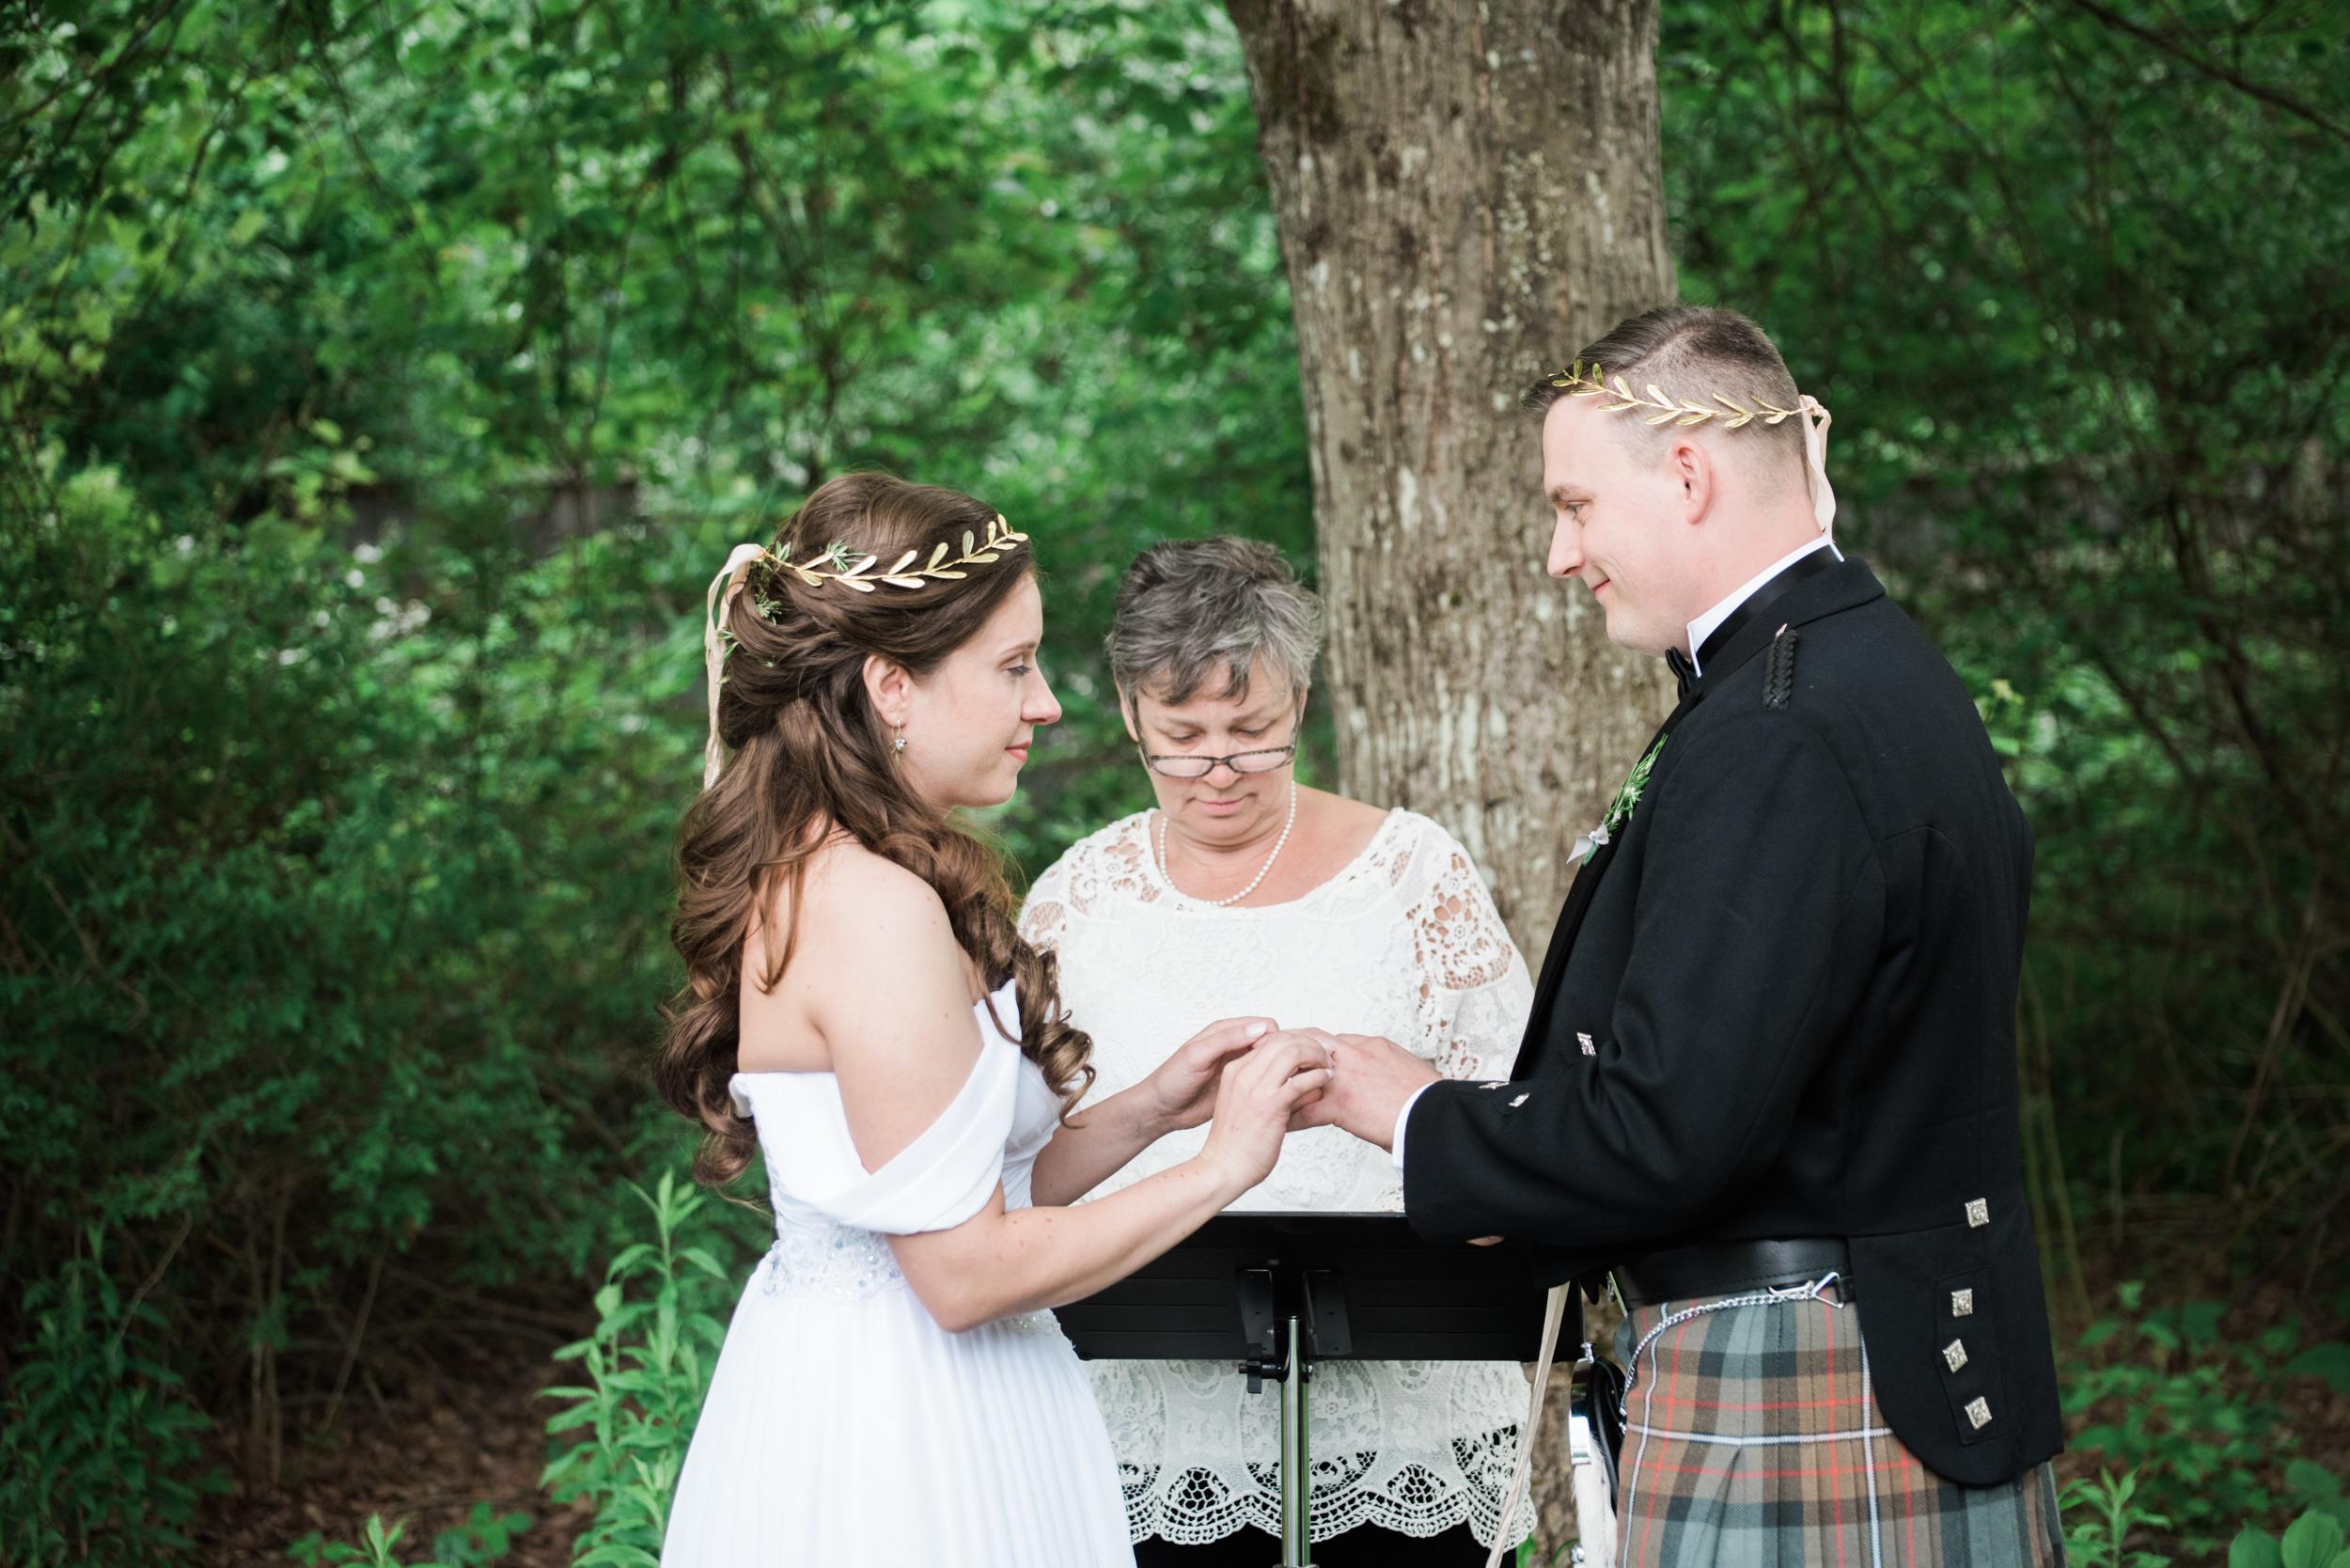 Wedding Photographers in Berkshires MA